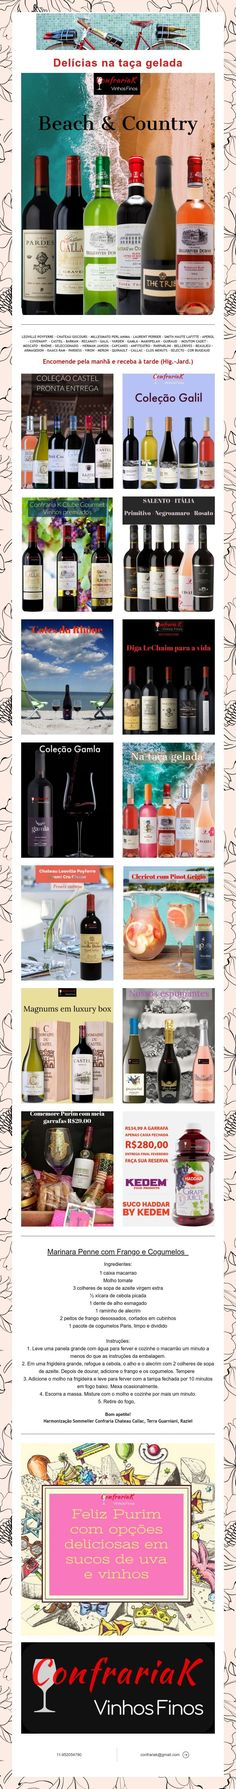 Delícias na taça gelada Mouton Cadet, Laurent Perrier, The Covenant, Ice, Wine Pairings